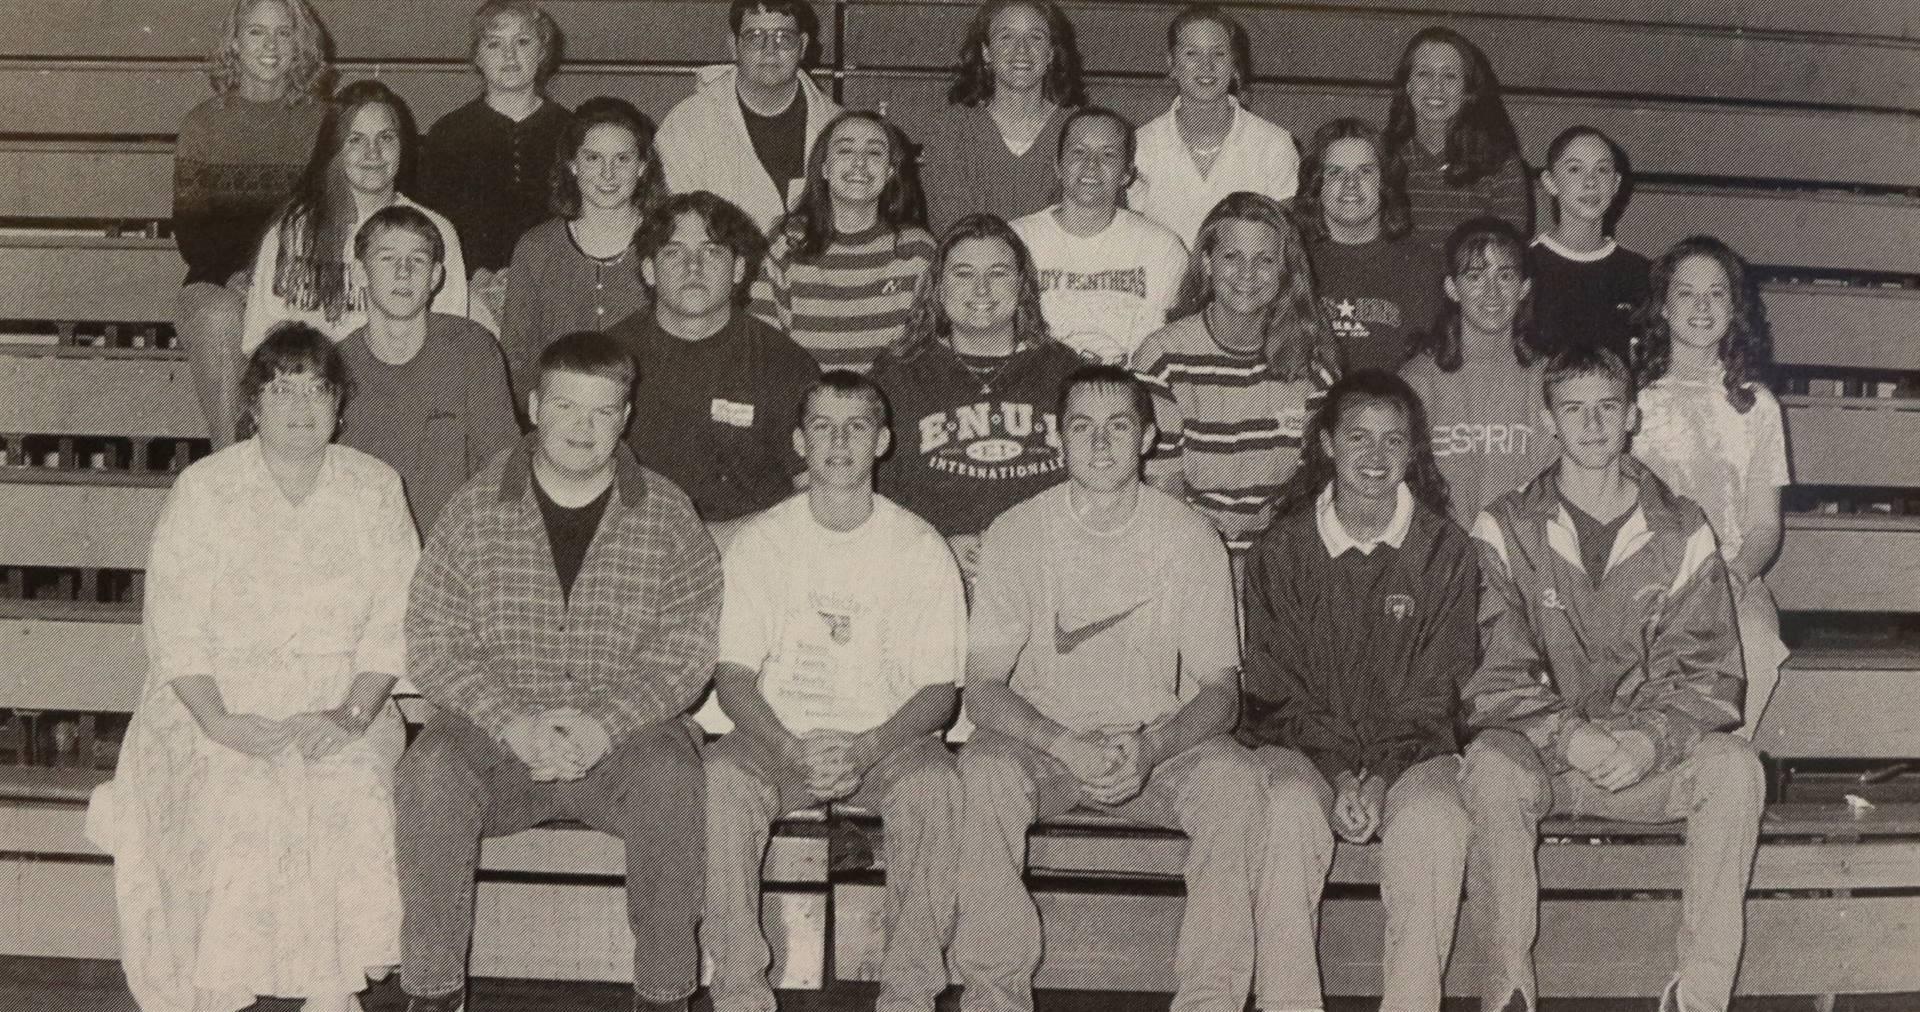 1997 National Honor Society